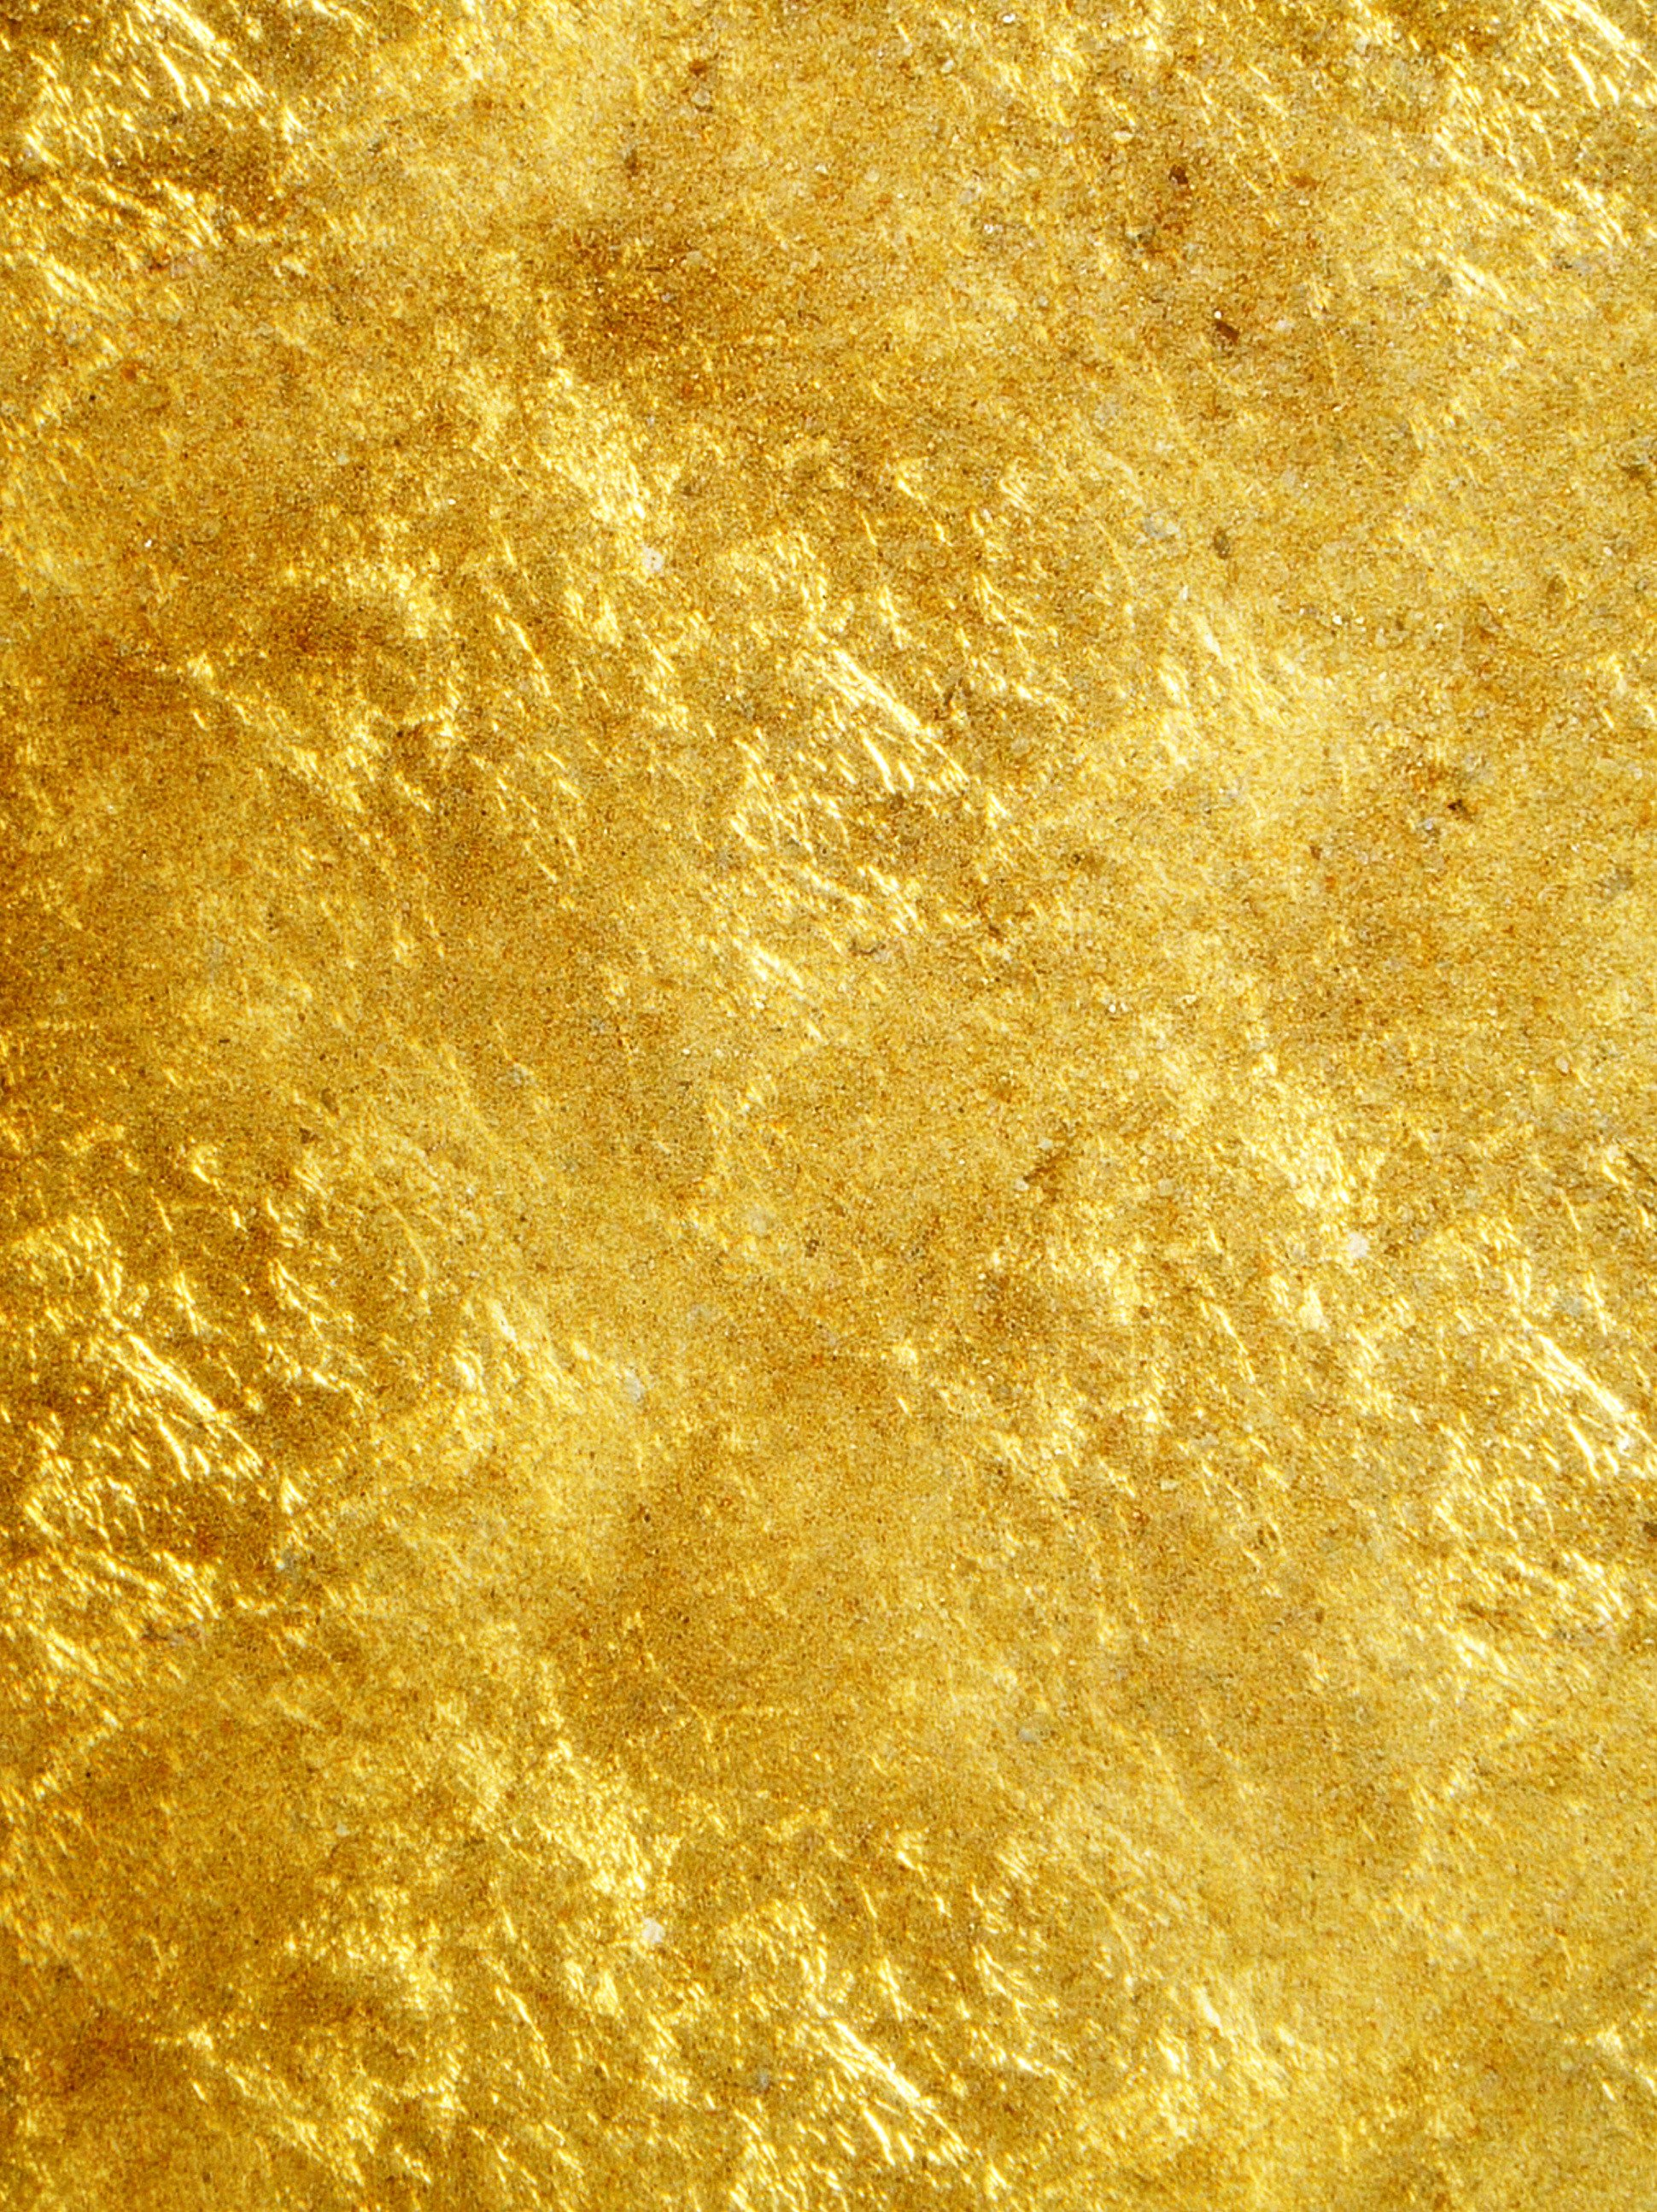 Free Gold Foil Texture 1000 Images About Goudkleurig On Pinterest